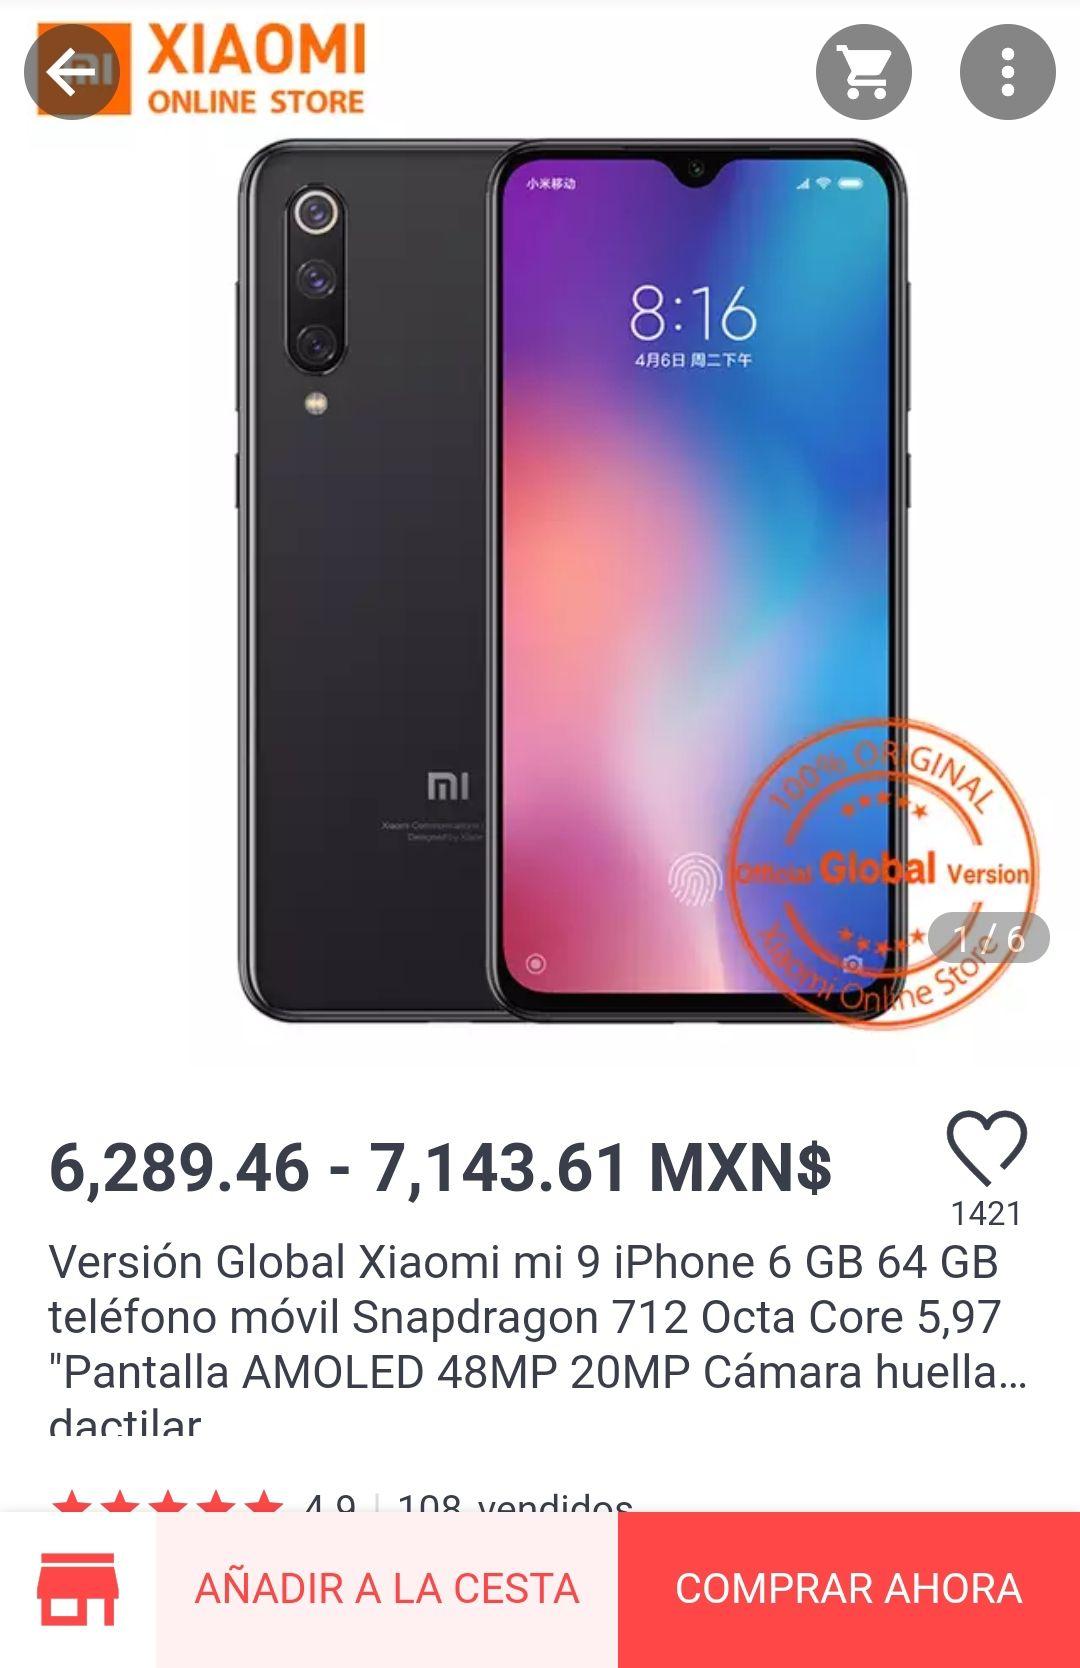 Aliexpress: Xiaomi Mi 9 SE